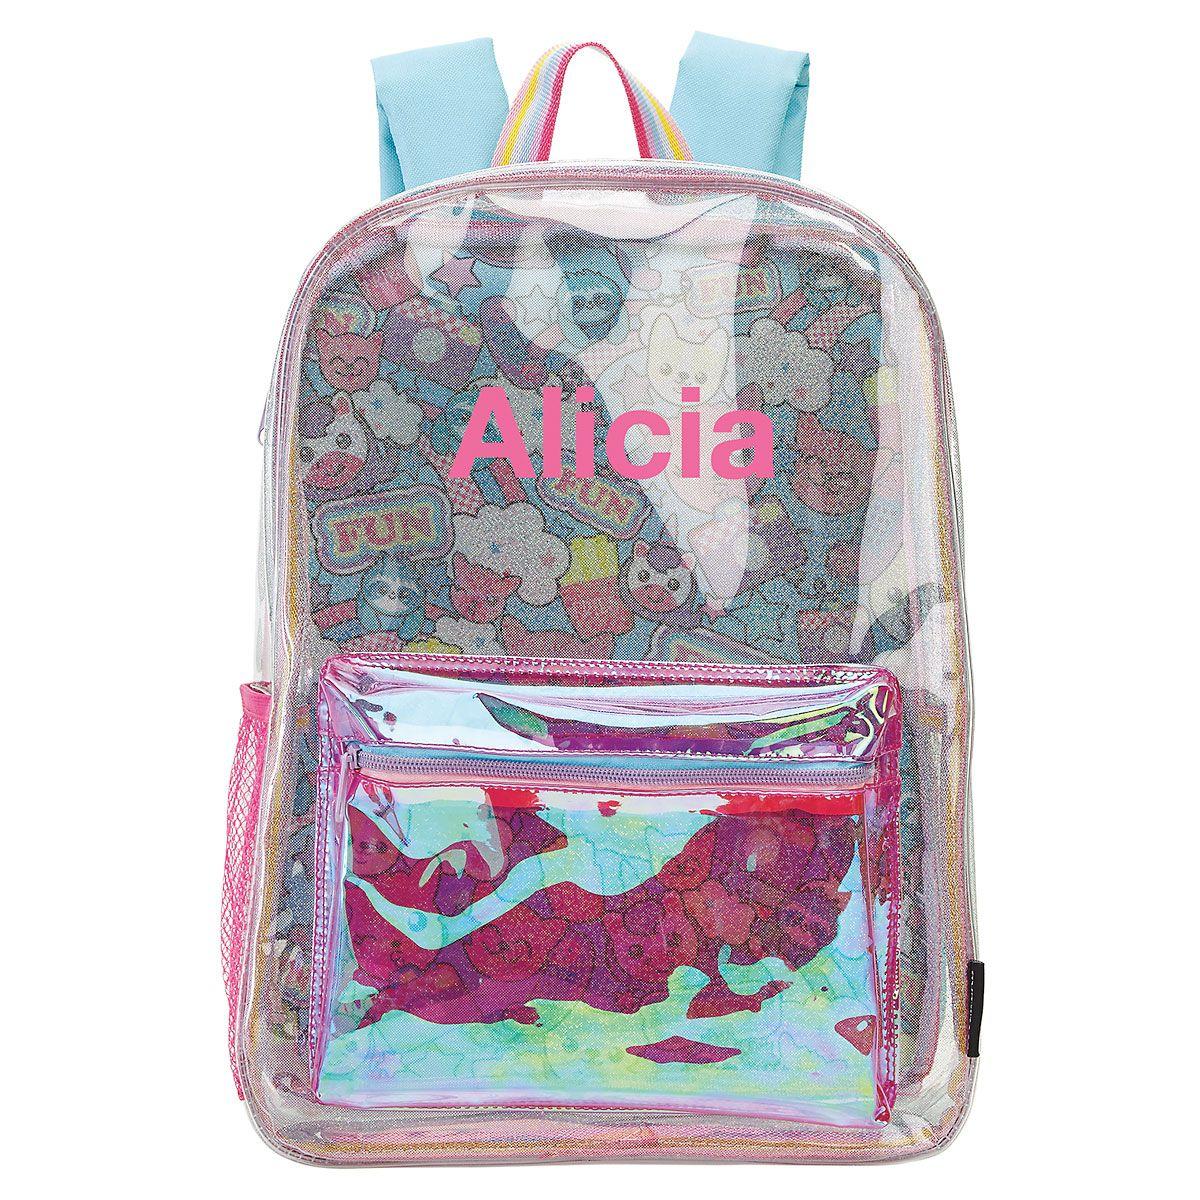 Personalized Clear Unicorn Emoji Fun Backpack